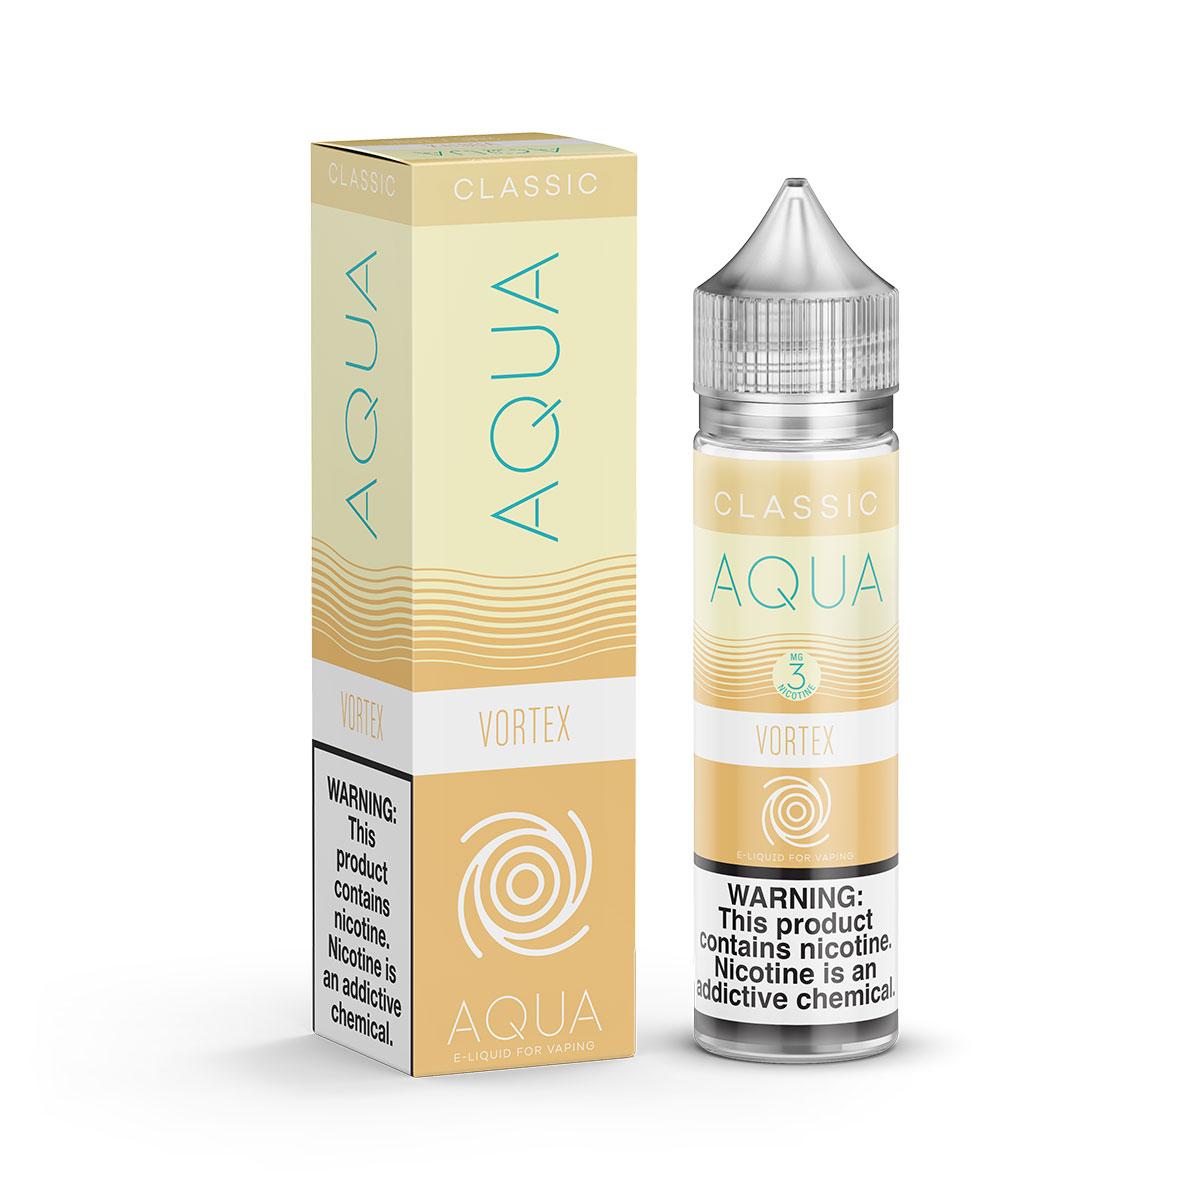 Aqua-Classic-60ml-Vortex-3mg.jpg